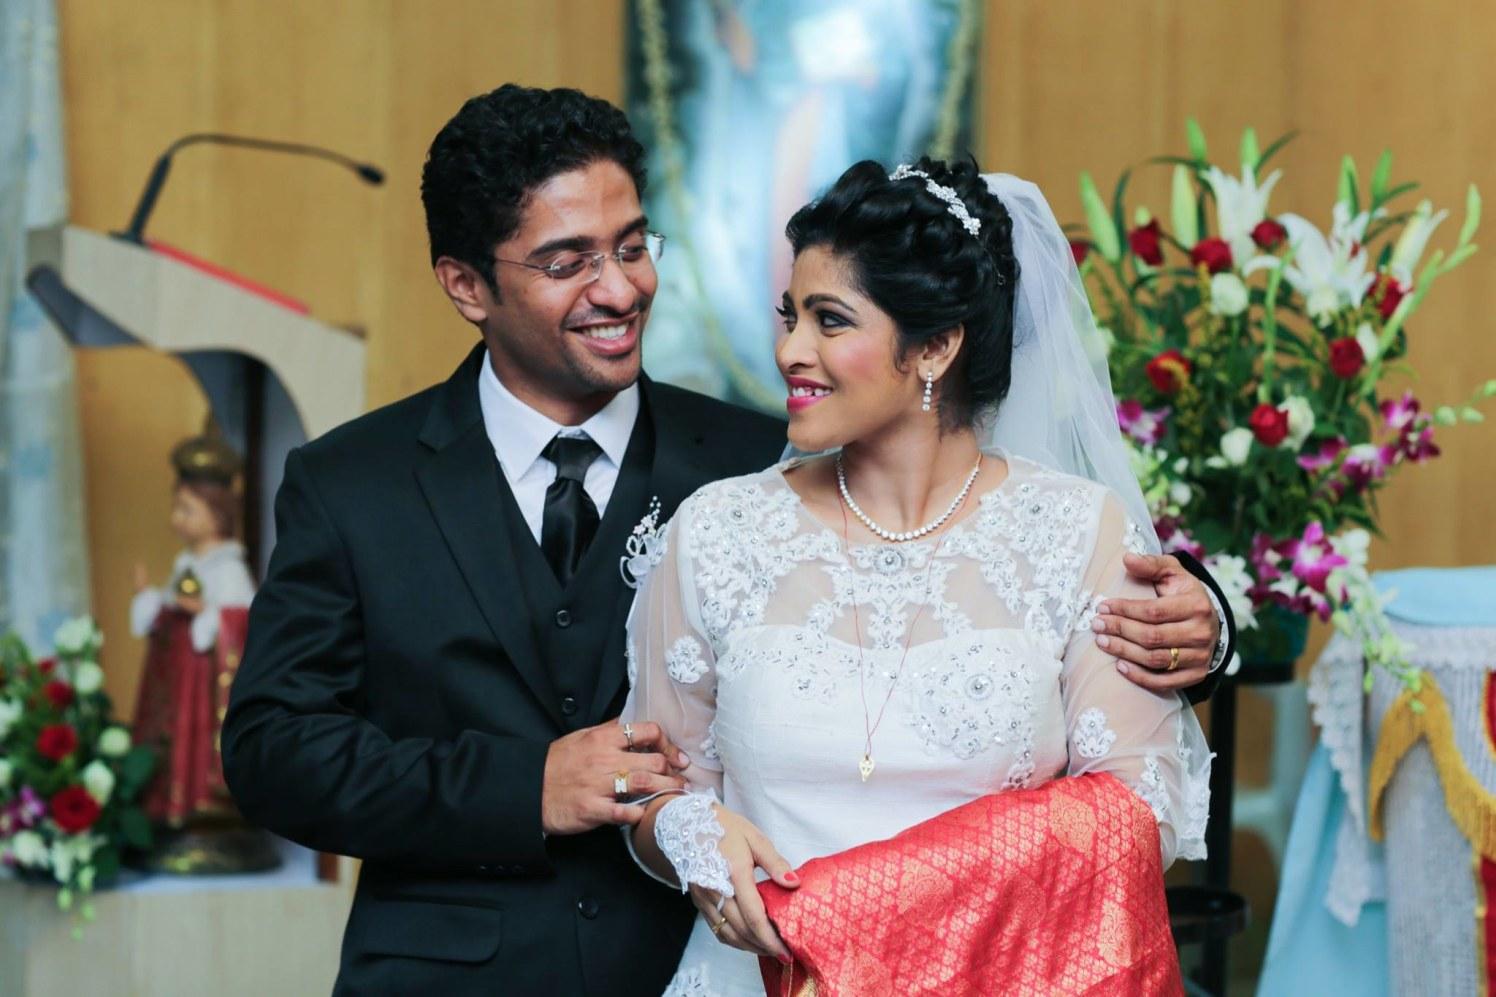 Christian Bride and Groom Wearing Appealing Formal Attire by Lloyd Bangera Wedding-photography | Weddings Photos & Ideas